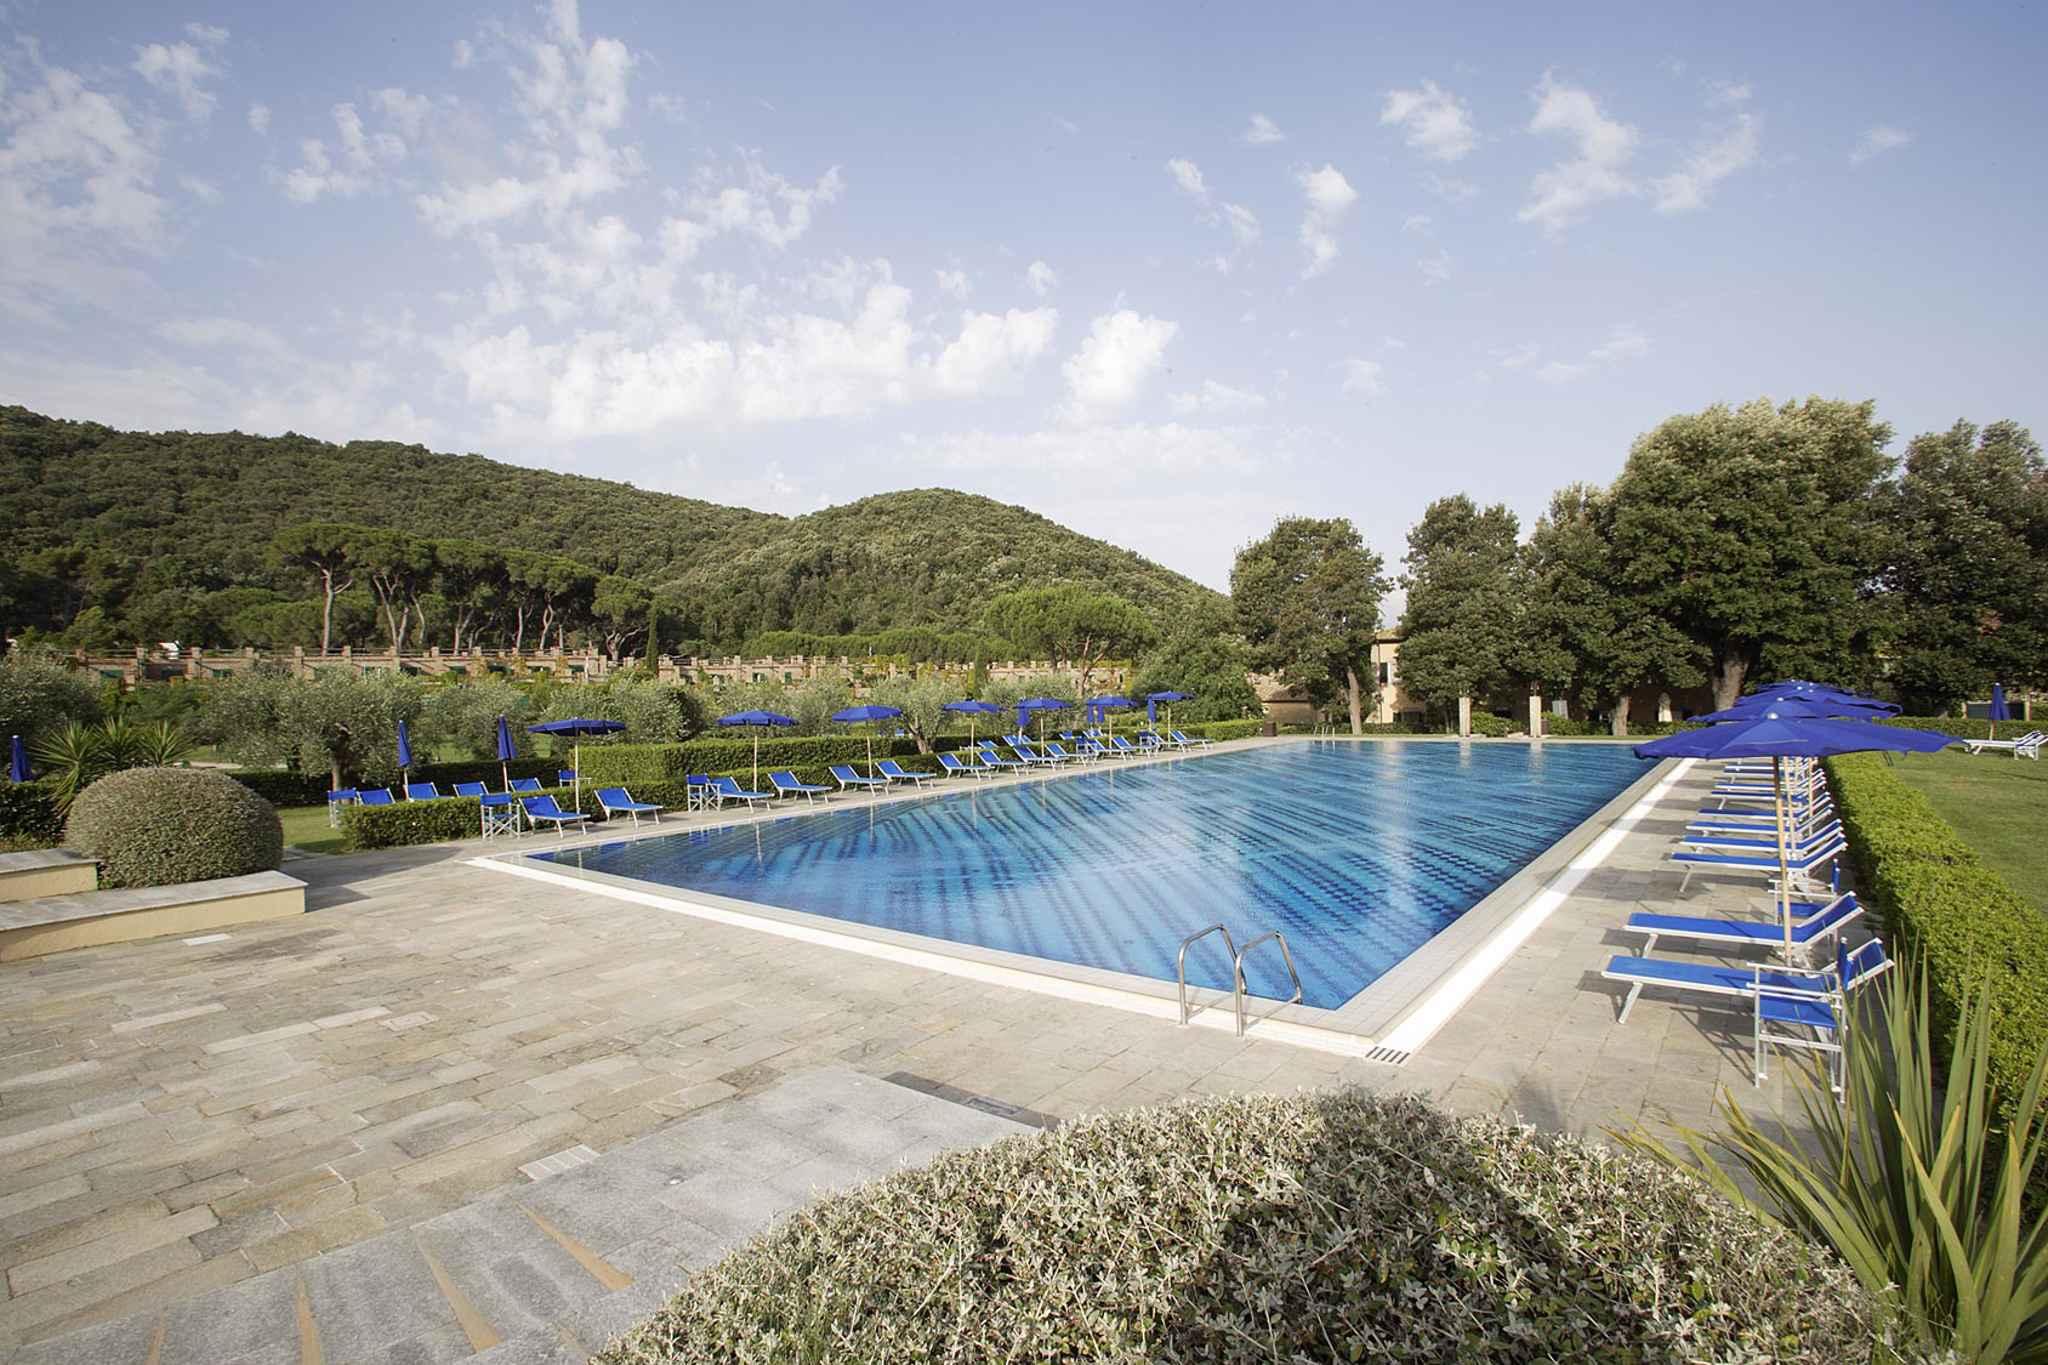 Ferienwohnung Residence Sant'Anna del Volterraio (403209), Rio Nell'Elba, Elba, Toskana, Italien, Bild 6